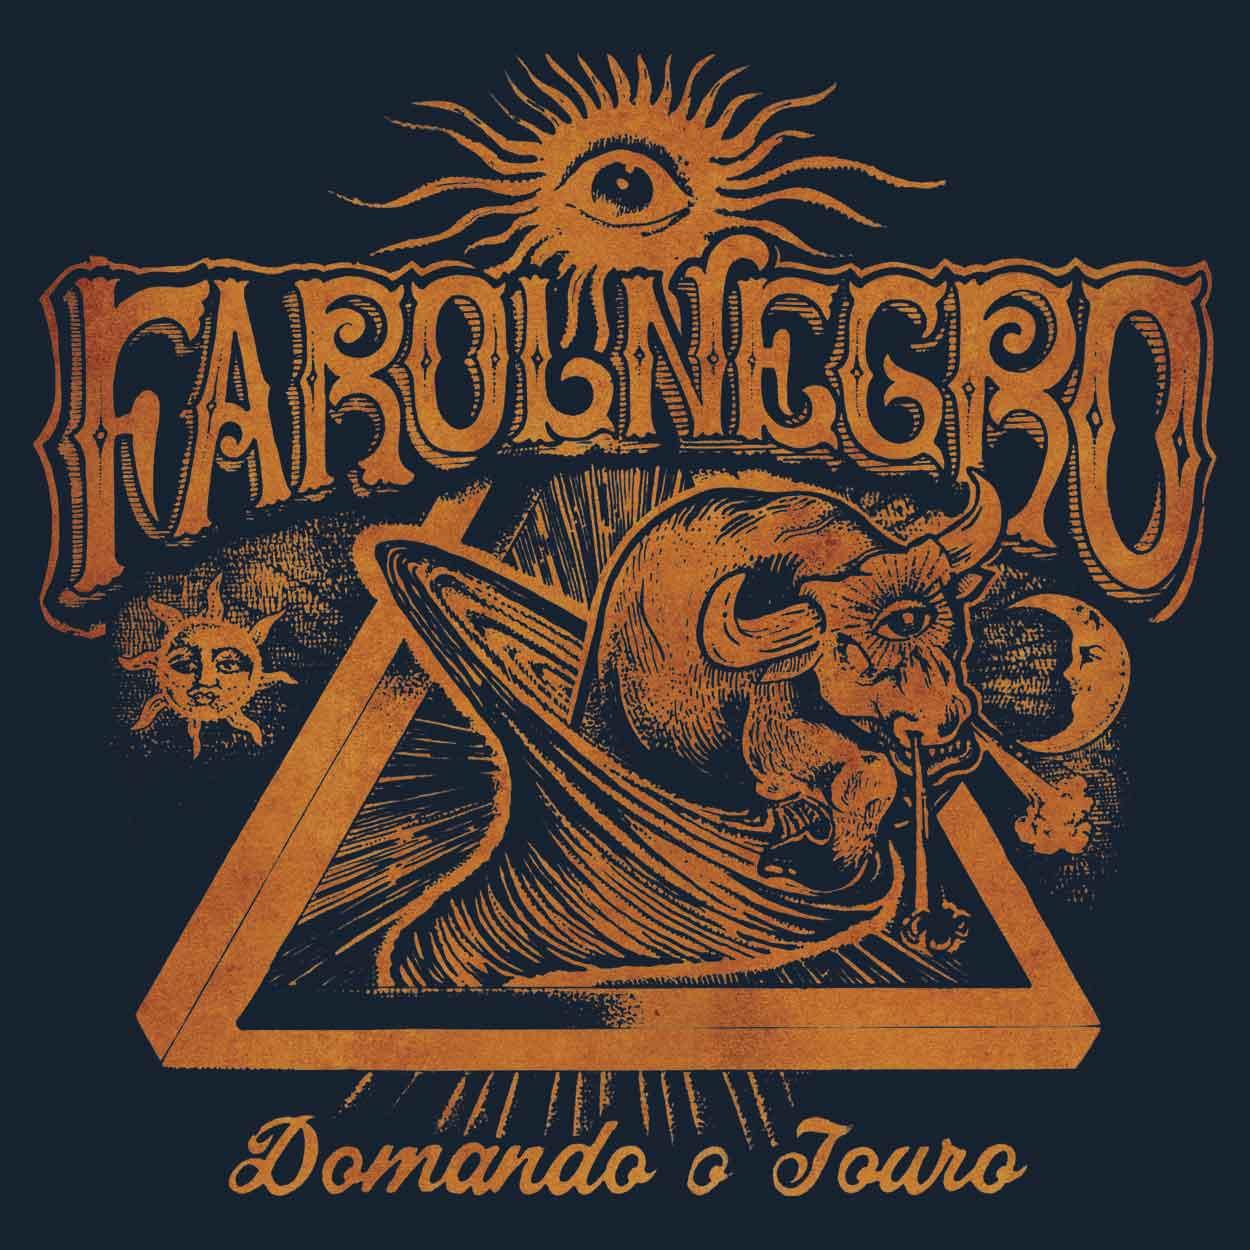 Camiseta - Domando o Touro - Farol Negro -  Masculino